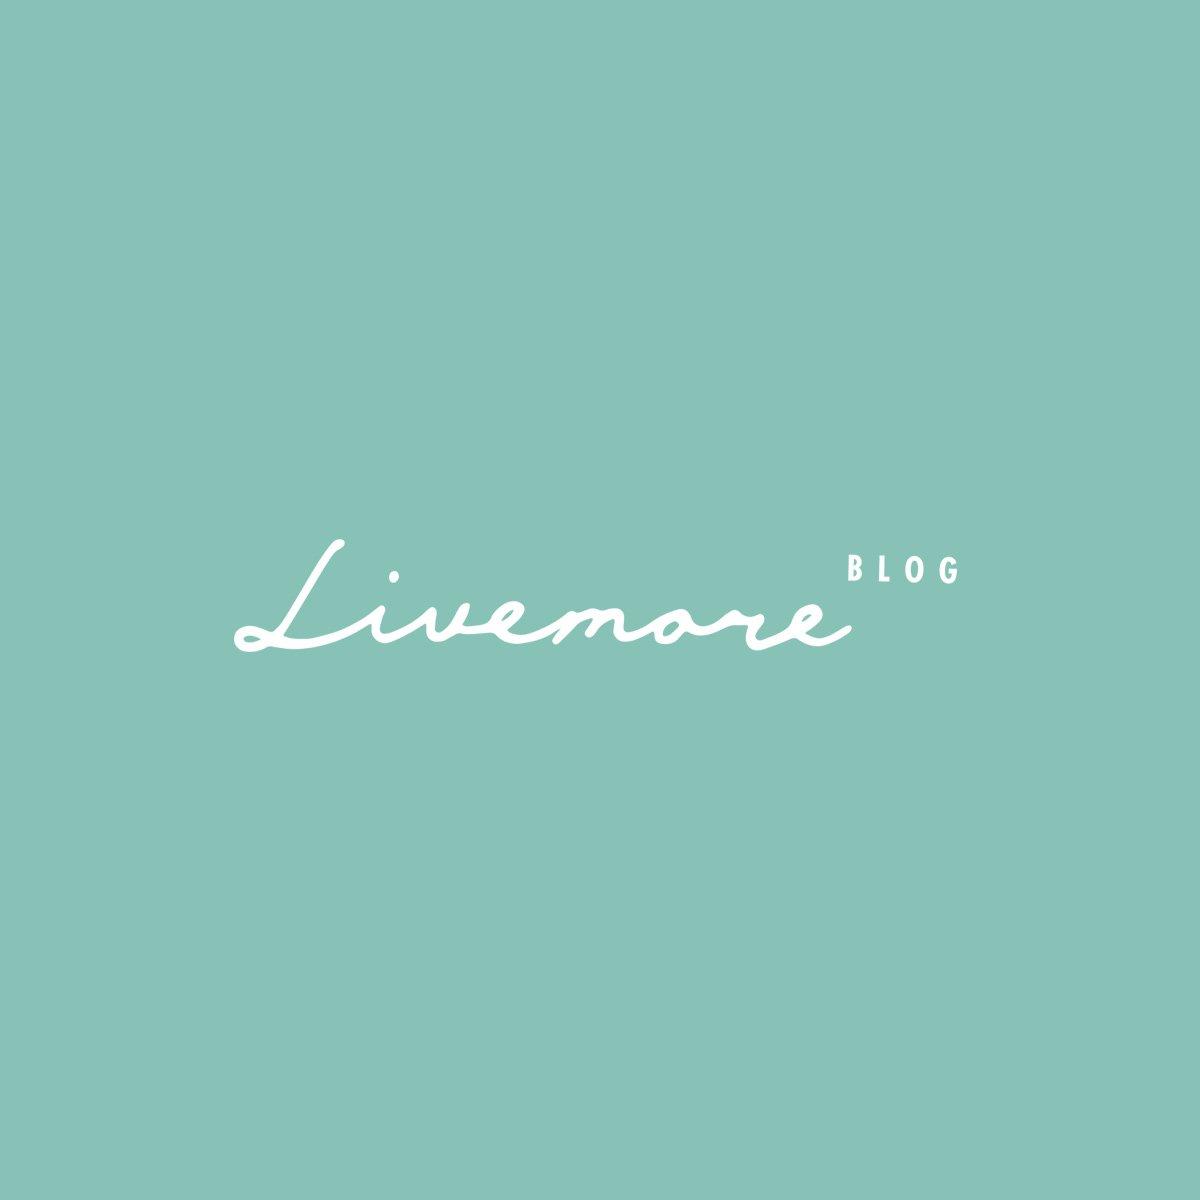 LivemoreBlog-trip-stories-surf